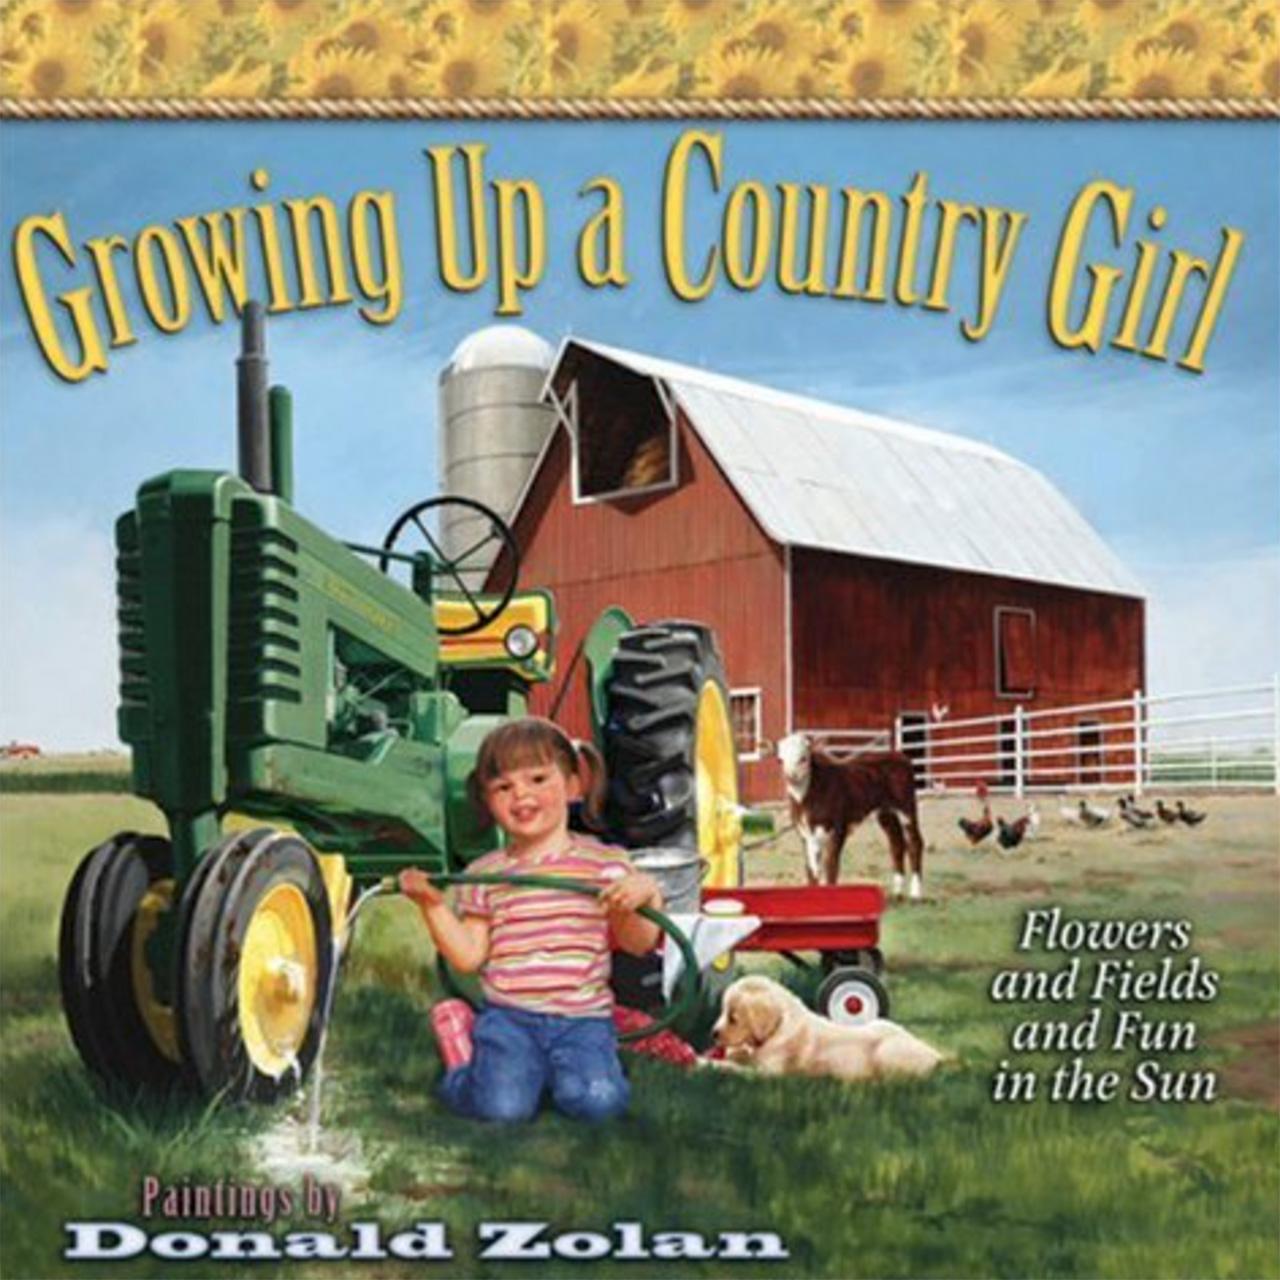 Donald Zolan classic kid's brand